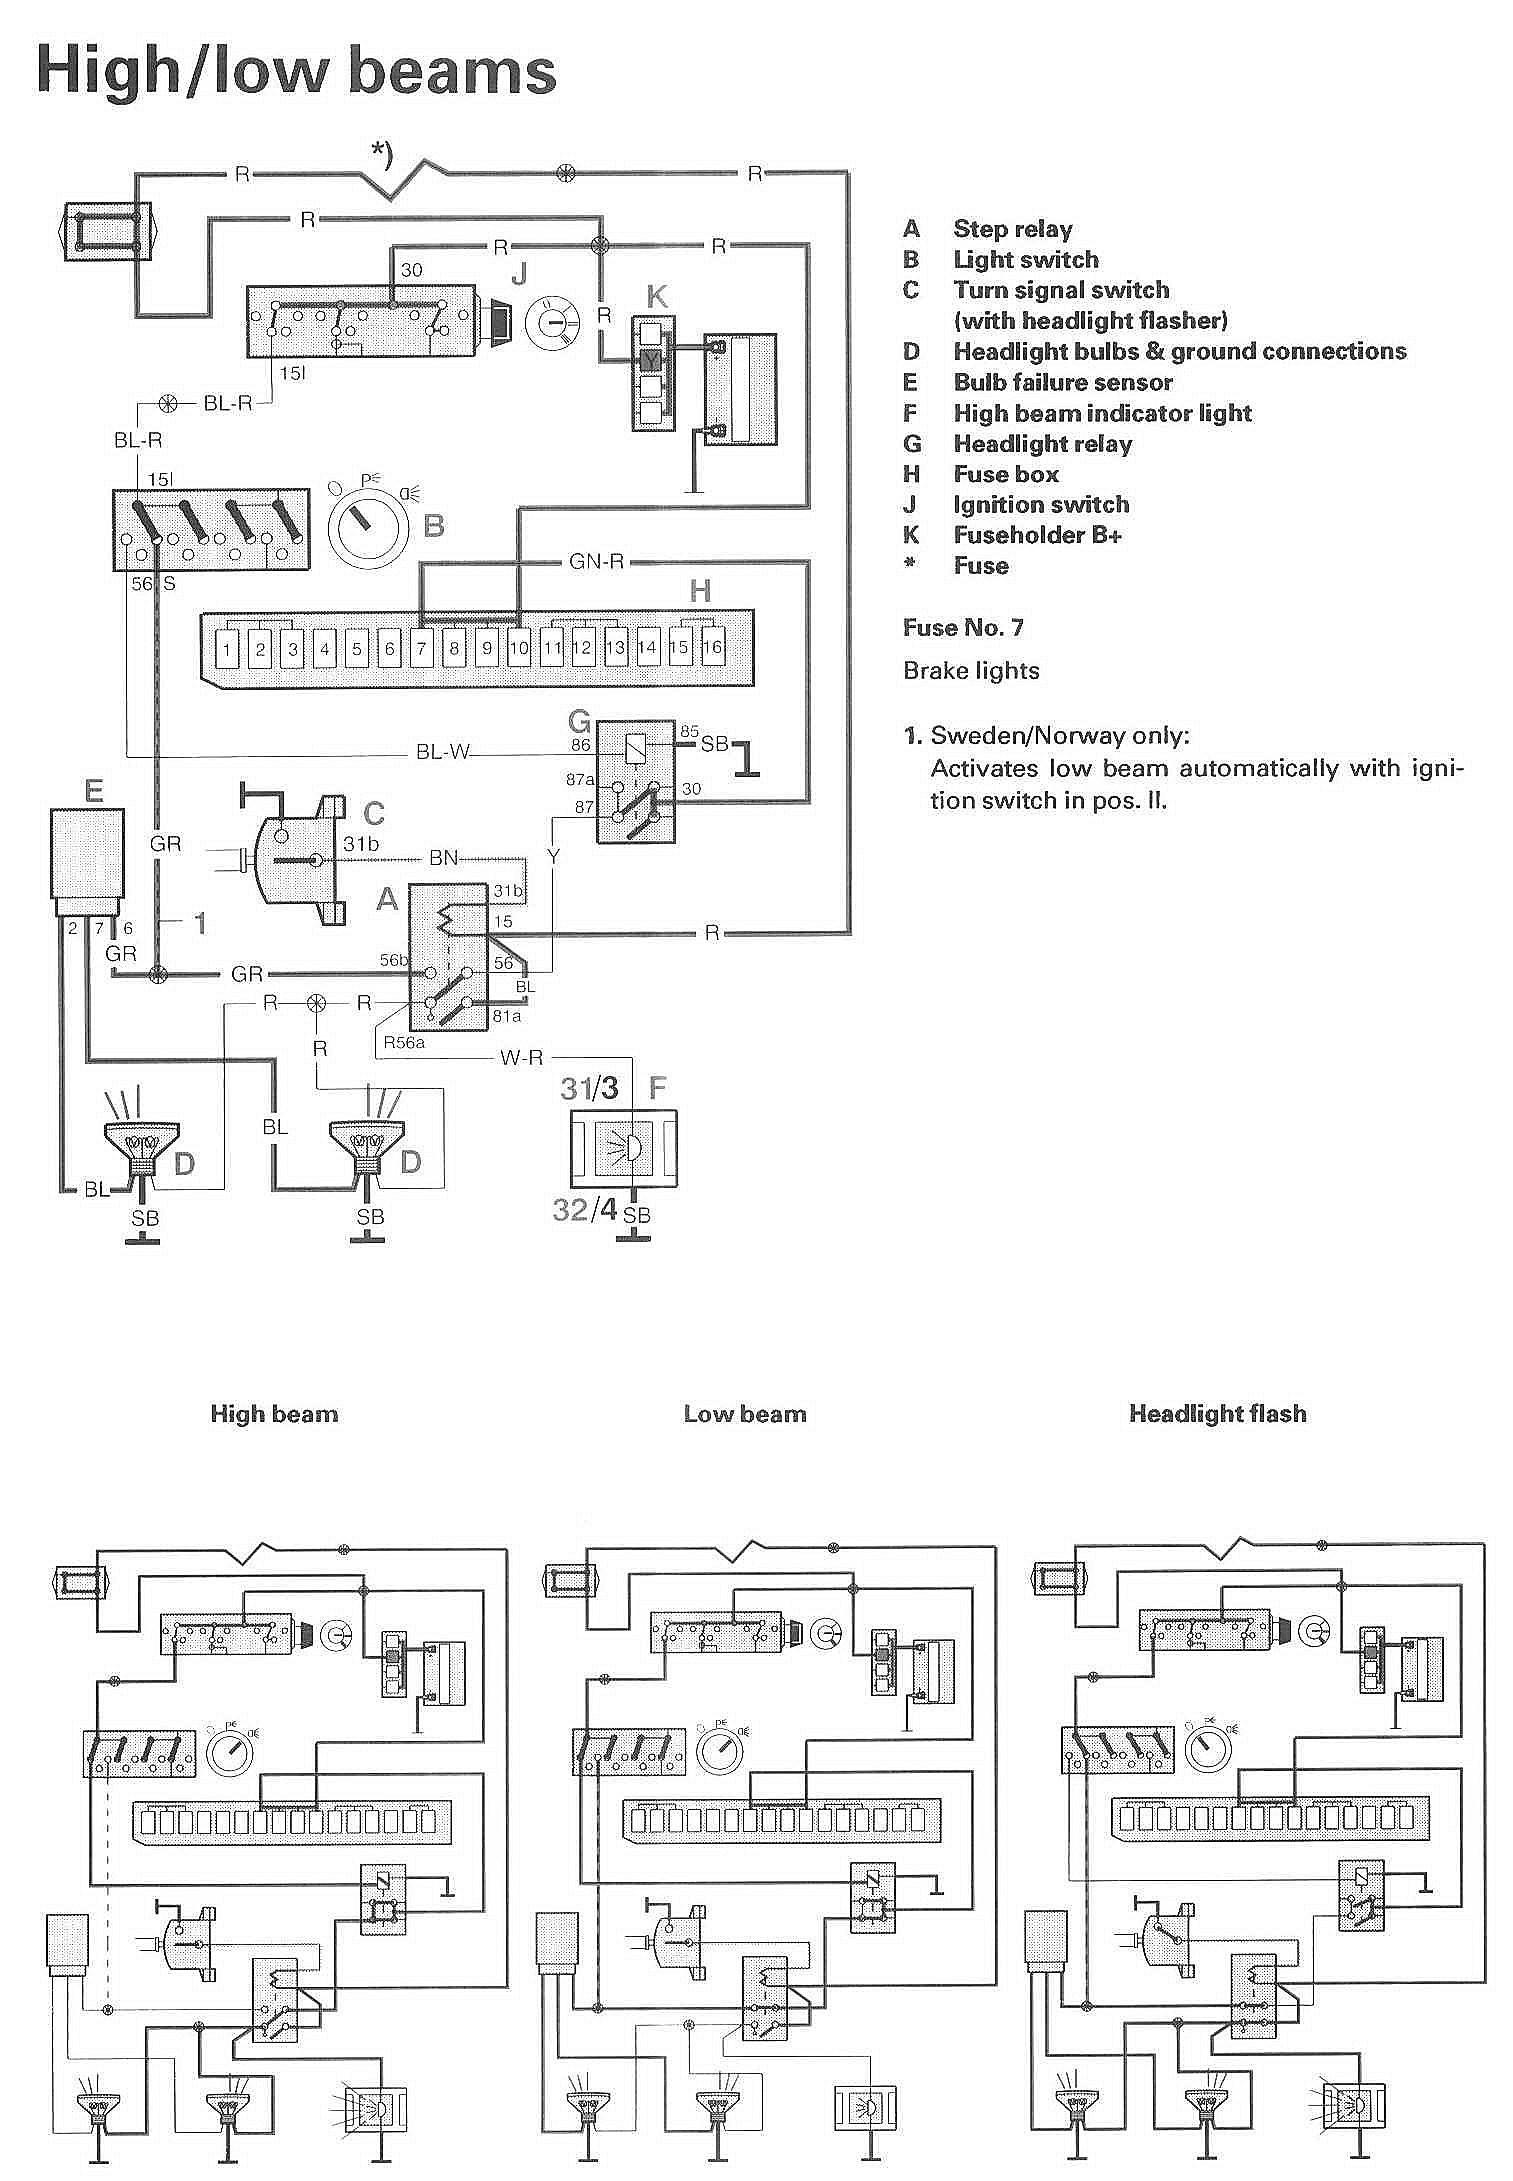 Window Switch Wiring Schematic | Wiring Library - Headlight Switch Wiring Diagram